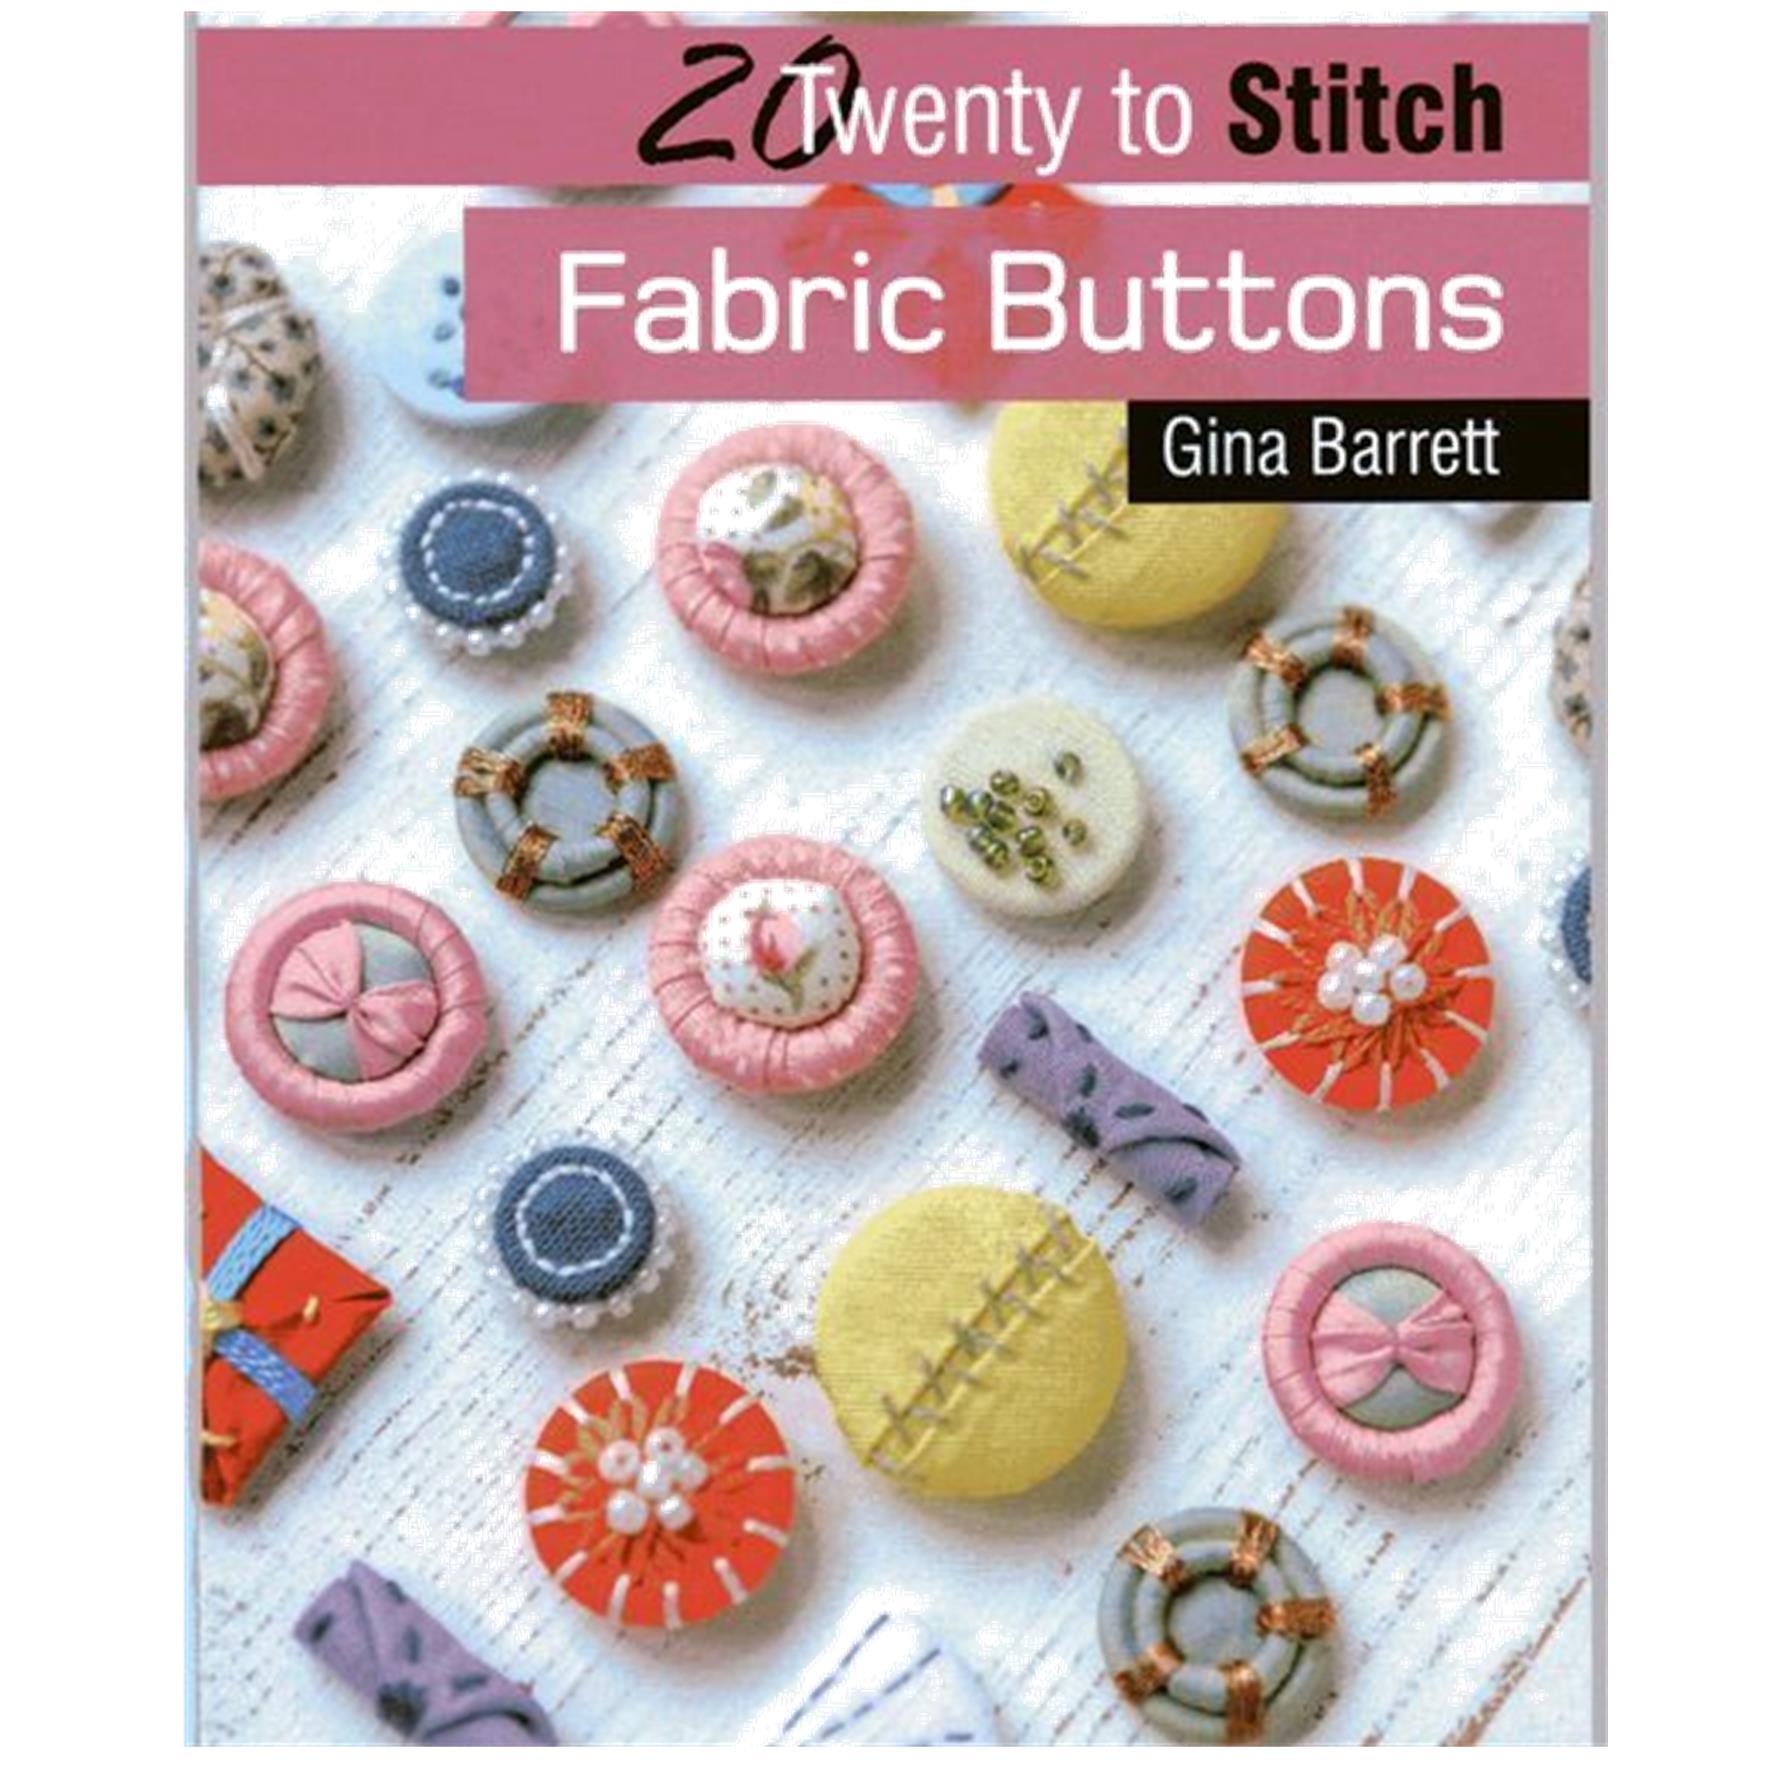 Twenty to Stitch – Fabric Buttons by Gina Barrett bxd